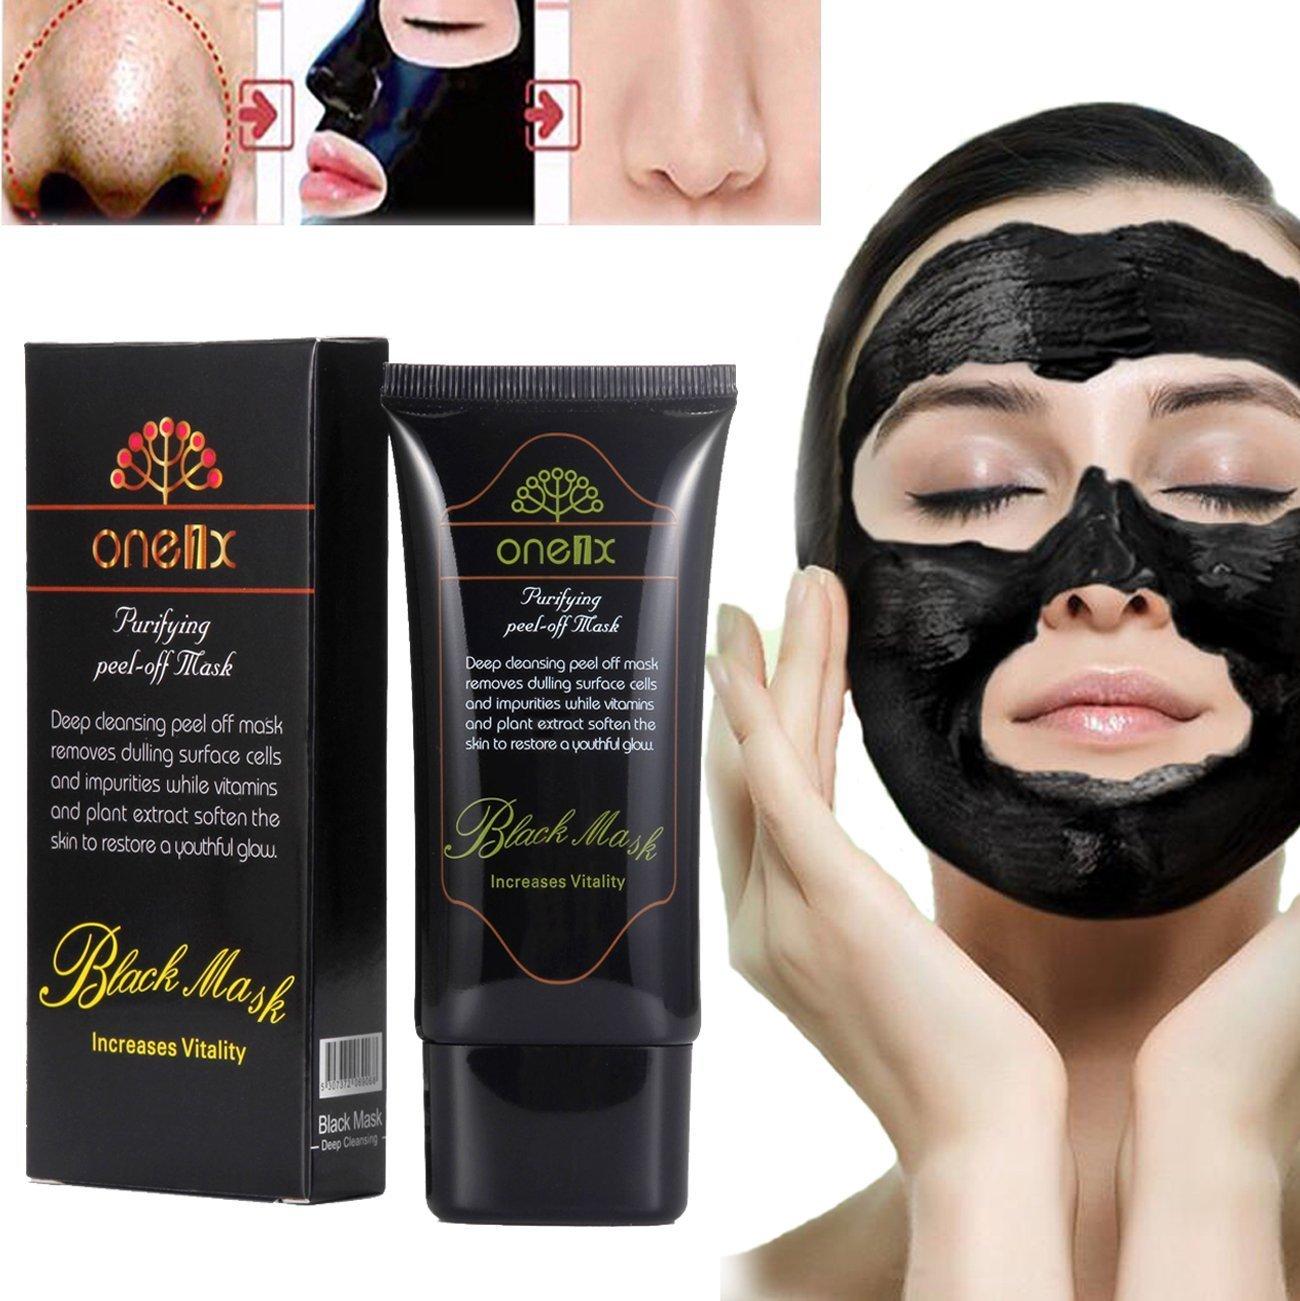 Blackhead masks, Face Mask, Blackhead Remover Black Mud Mask, Facial Care Tearing style Deep Clean Blackhead Removal Cleaning Mineral Mud Peel Off Mask (50ml) Boolavard